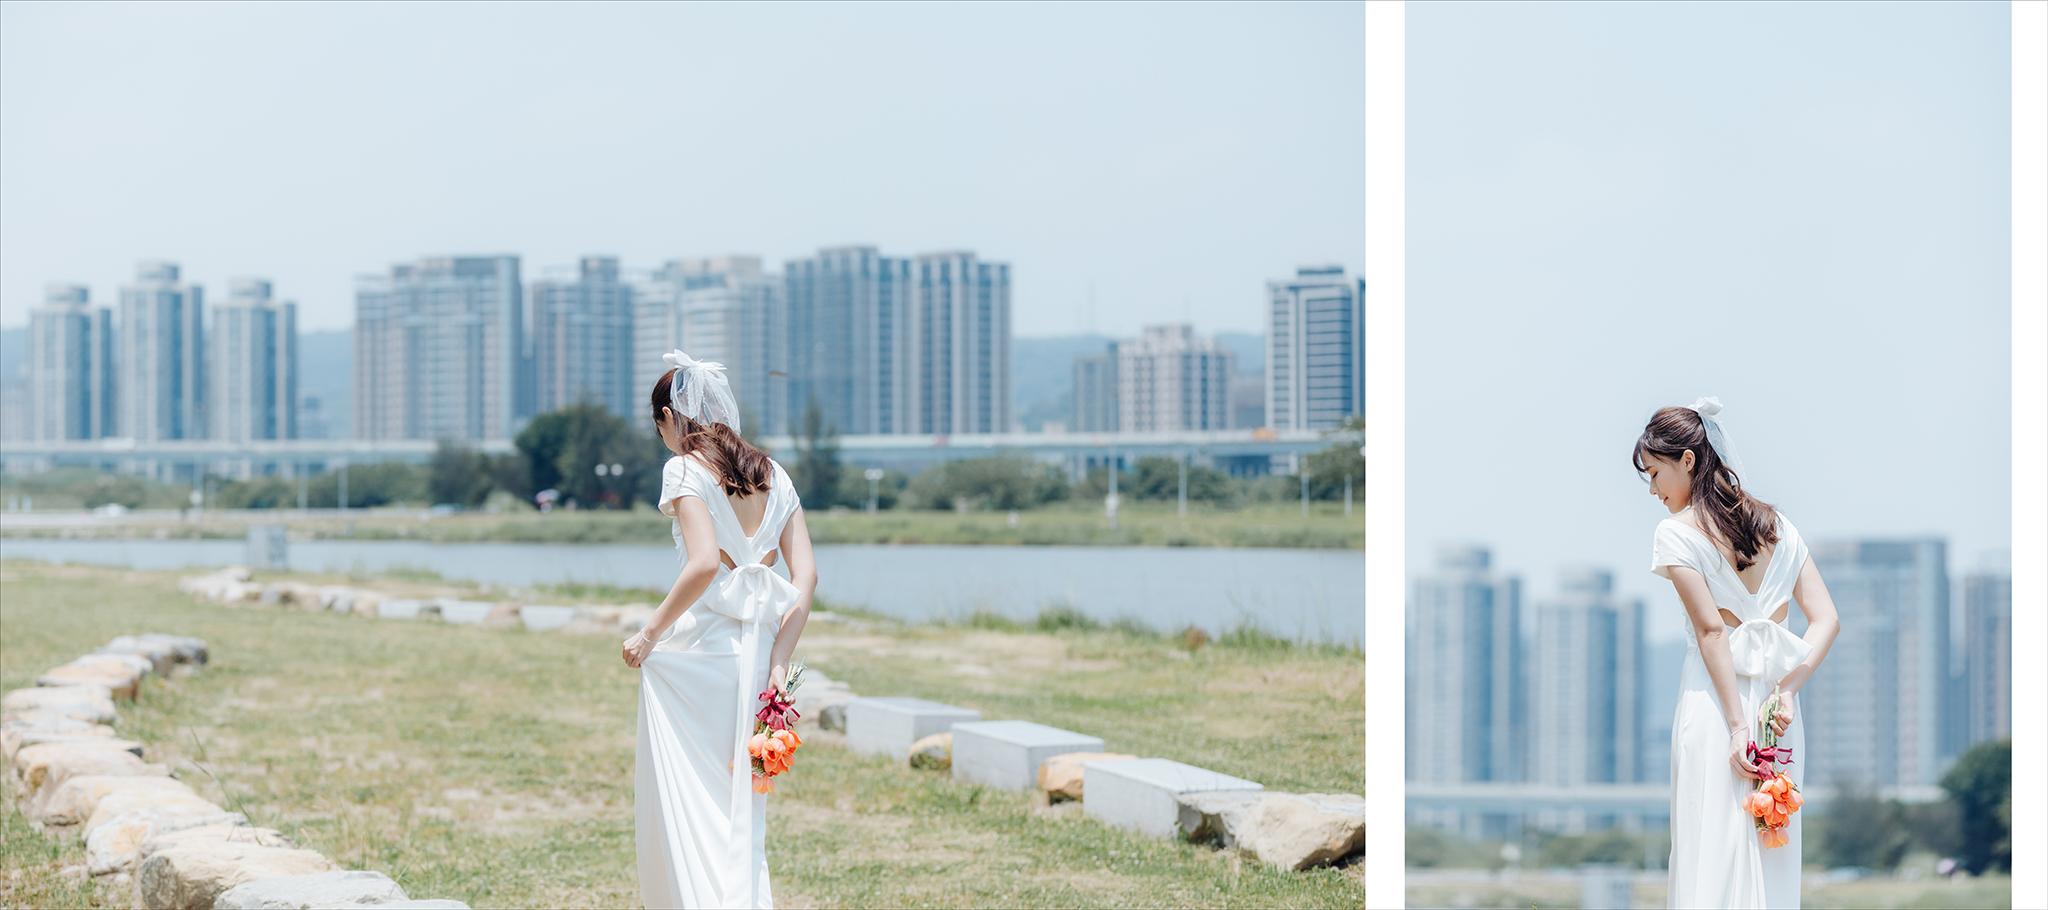 50082038321 6bea5abf98 o - 【自主婚紗】+Mei+